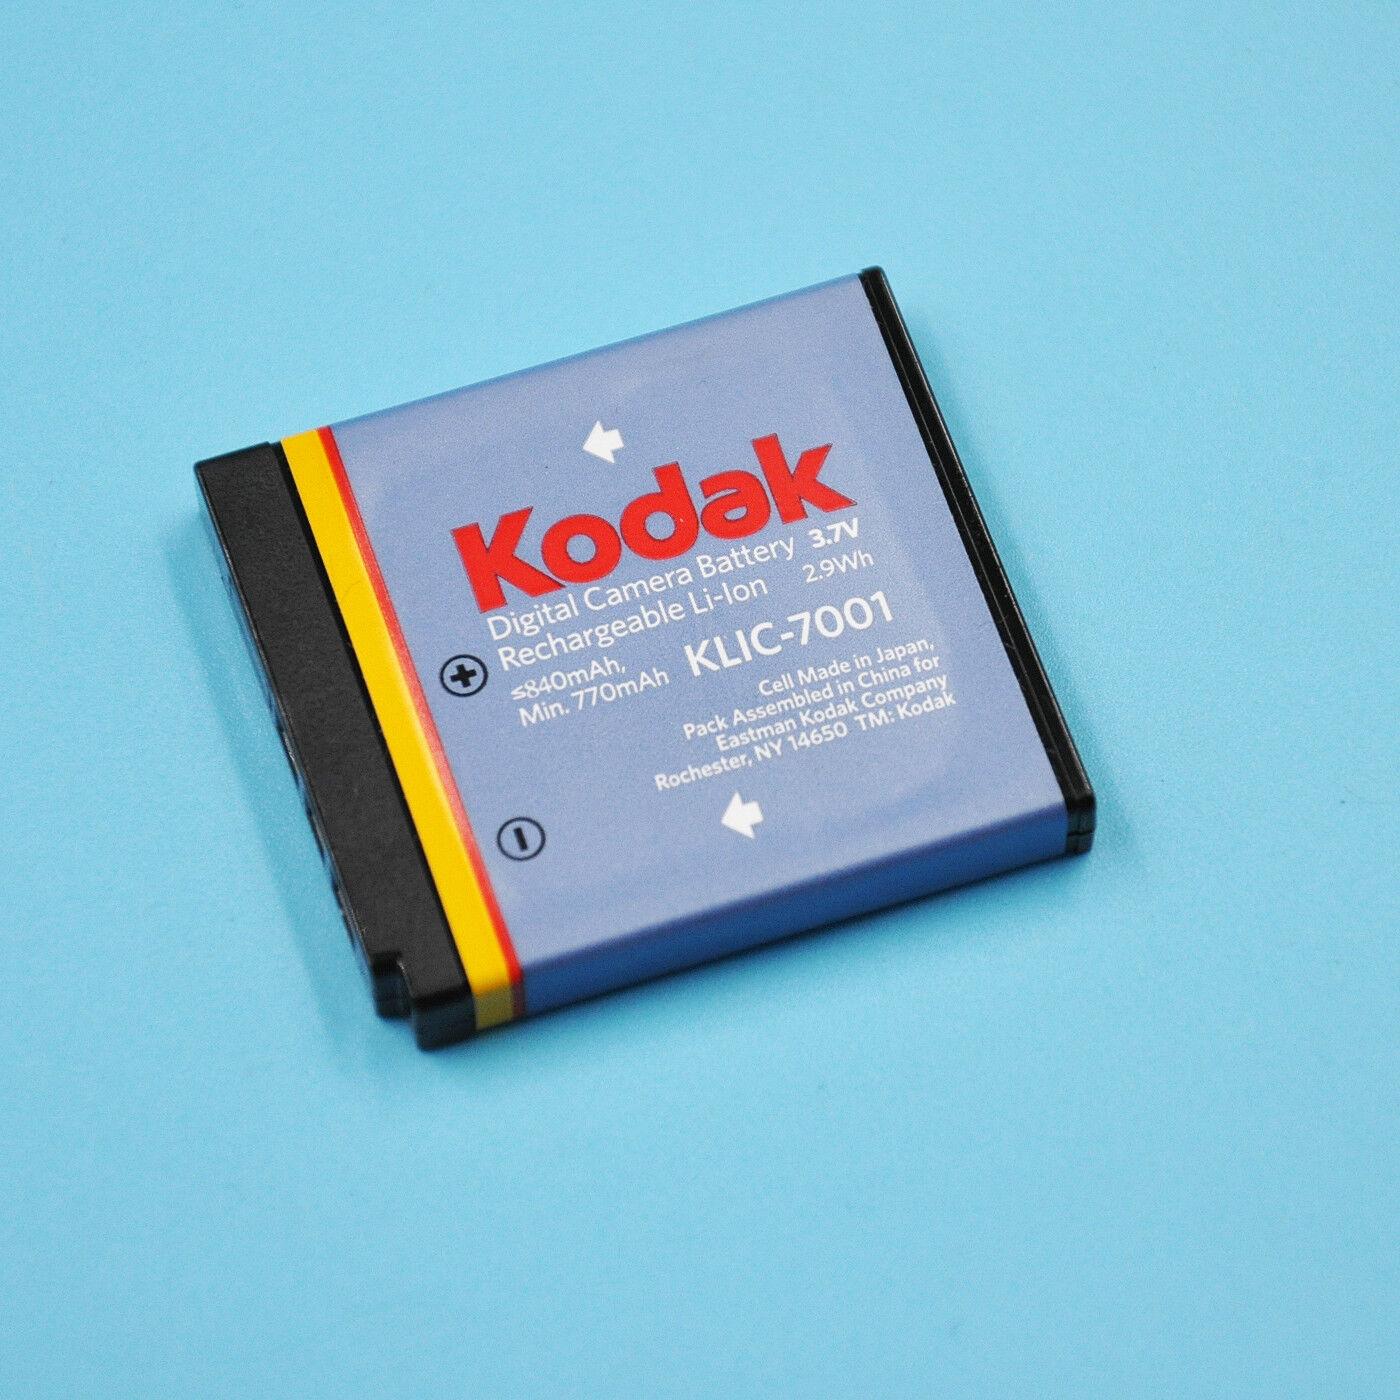 7001 KLIC batería 7001 7001 KLIC Bateria para kodak KLIC